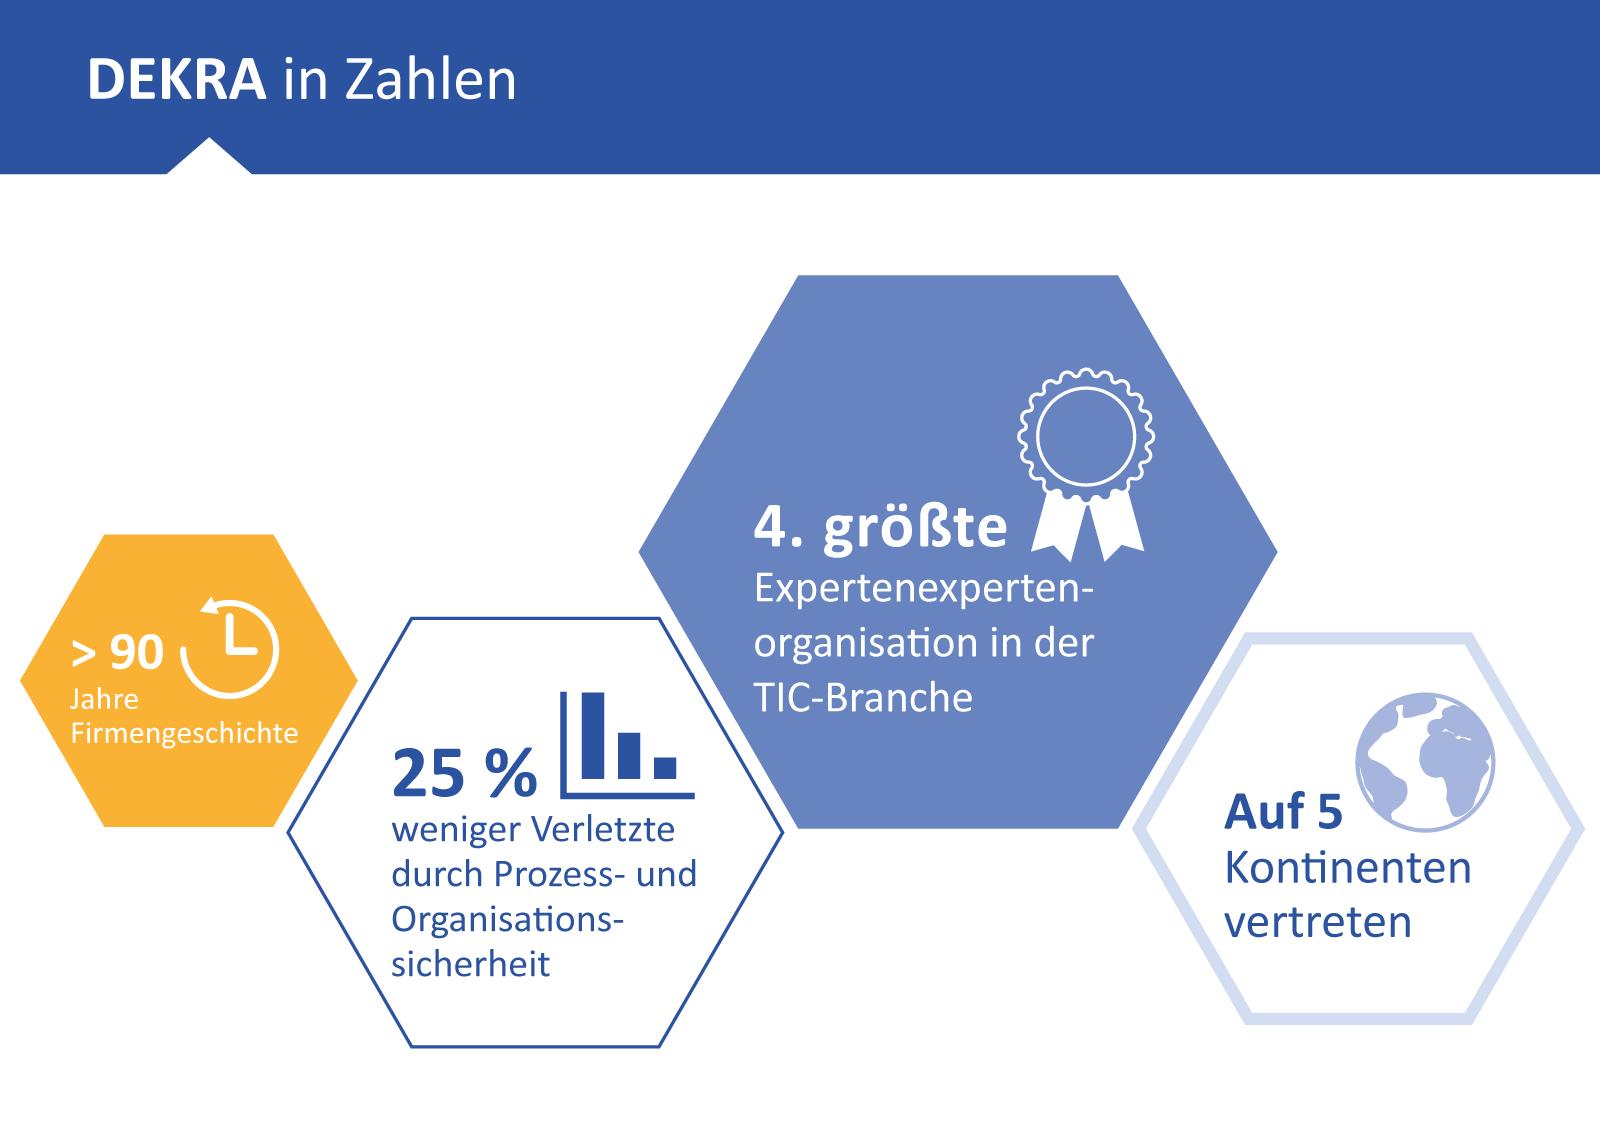 Portrino Referenz: DEKRA Gruppe in Zahlen